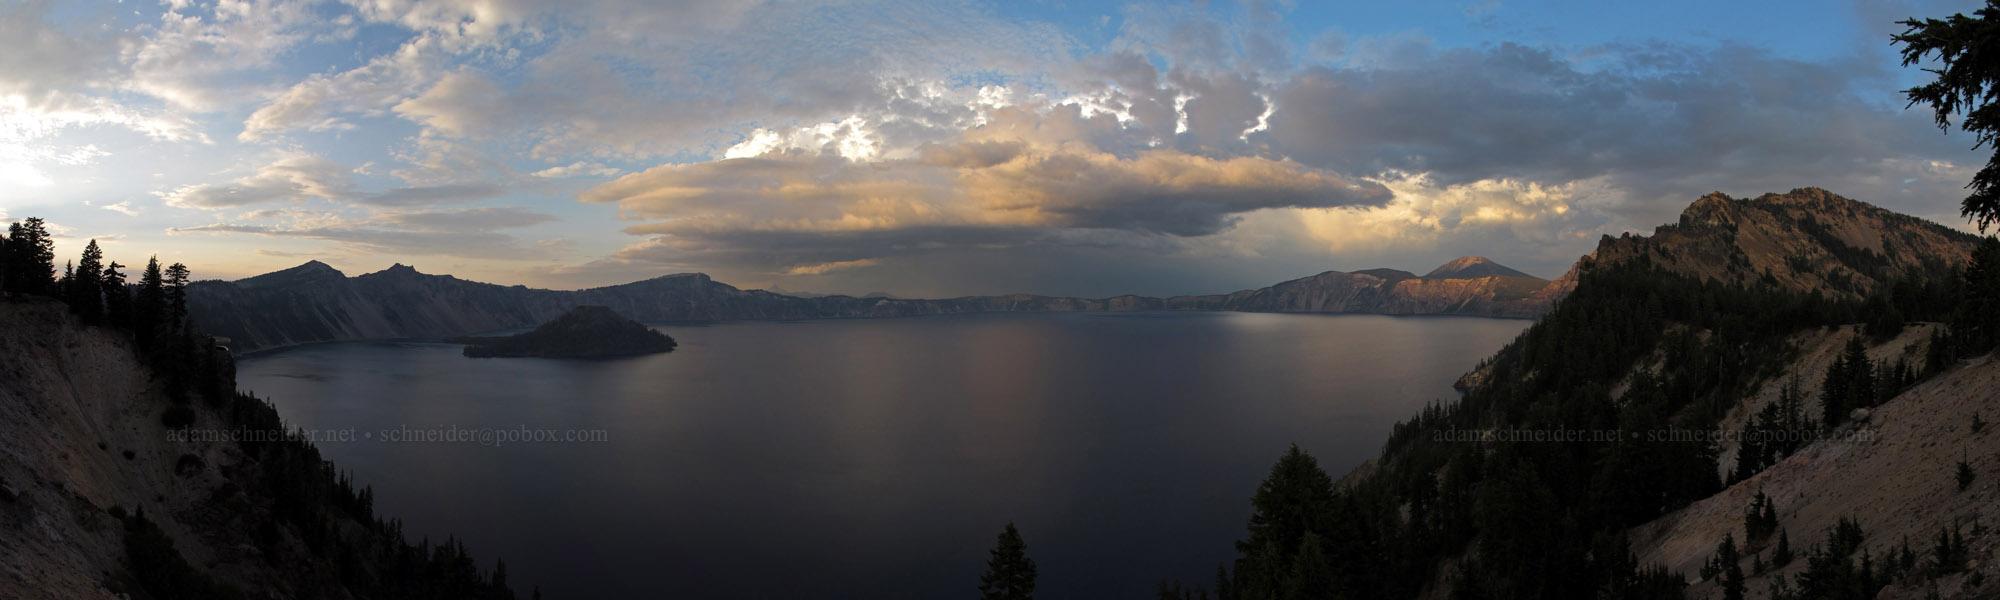 Crater Lake thunderstorm panorama [Crater Lake Lodge, Crater Lake National Park, Oregon]